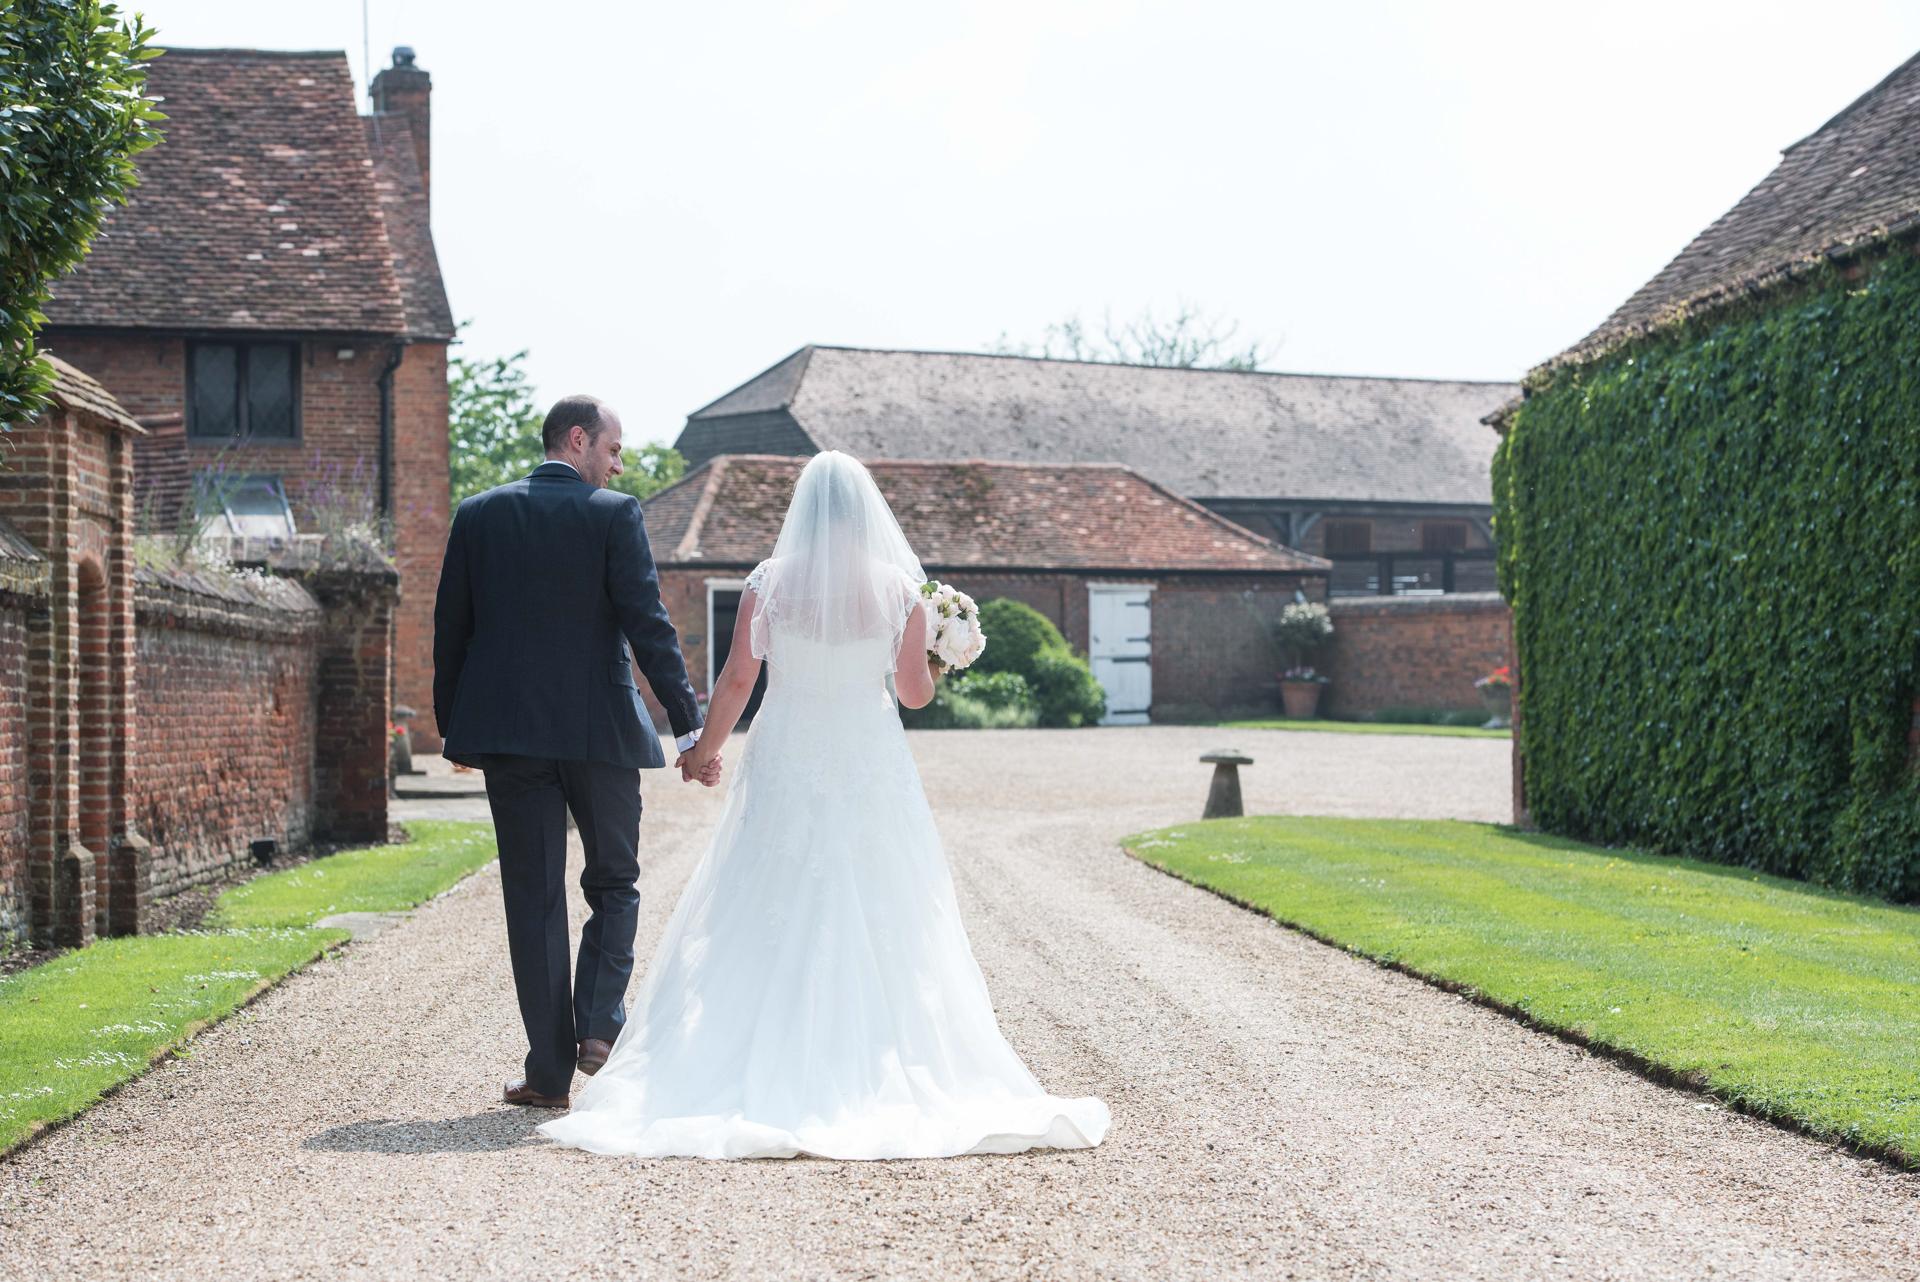 Lillibrook Manor Barn Wedding, Maidenhead, Alexandria Hall Photography (52 of 82).jpg